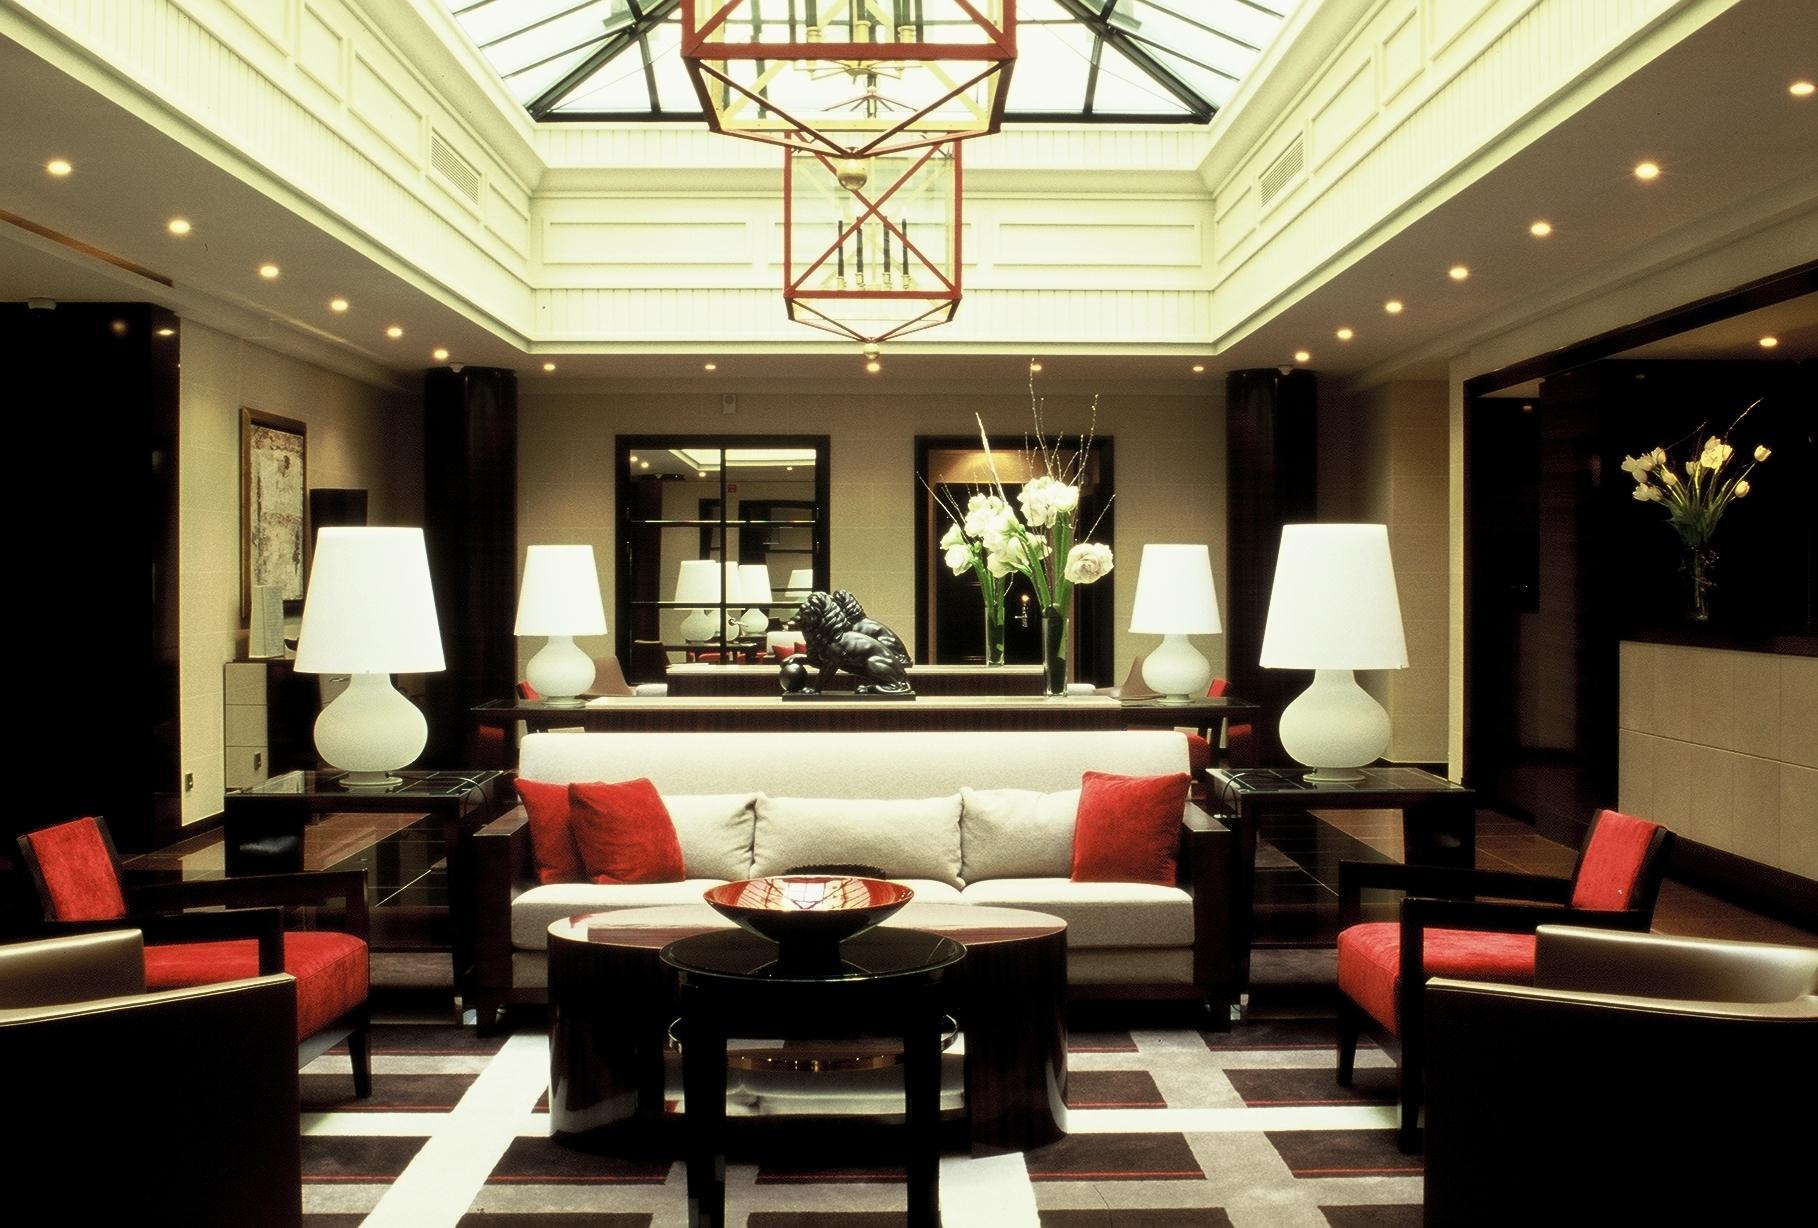 Hotel Arty Paris